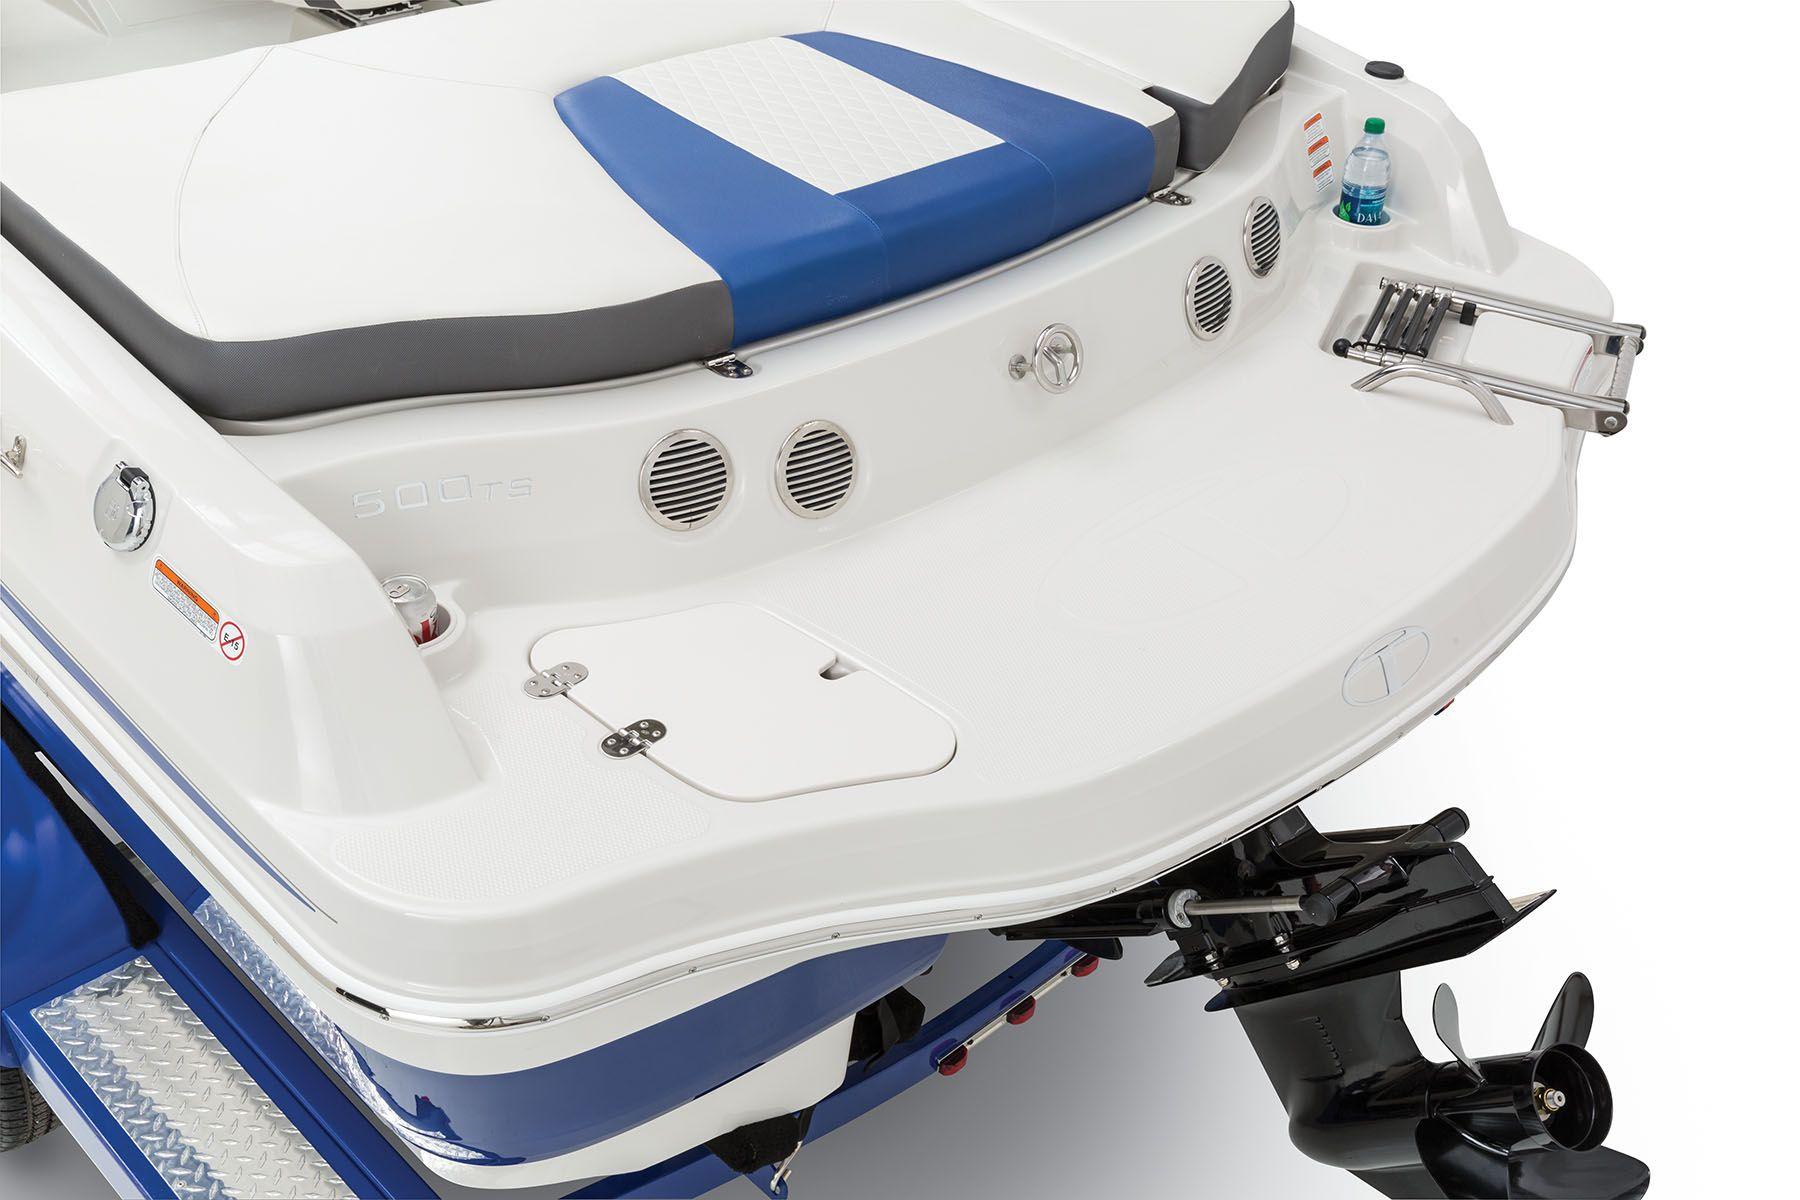 Full-width oversized aft swim platform w/top-loading, fold